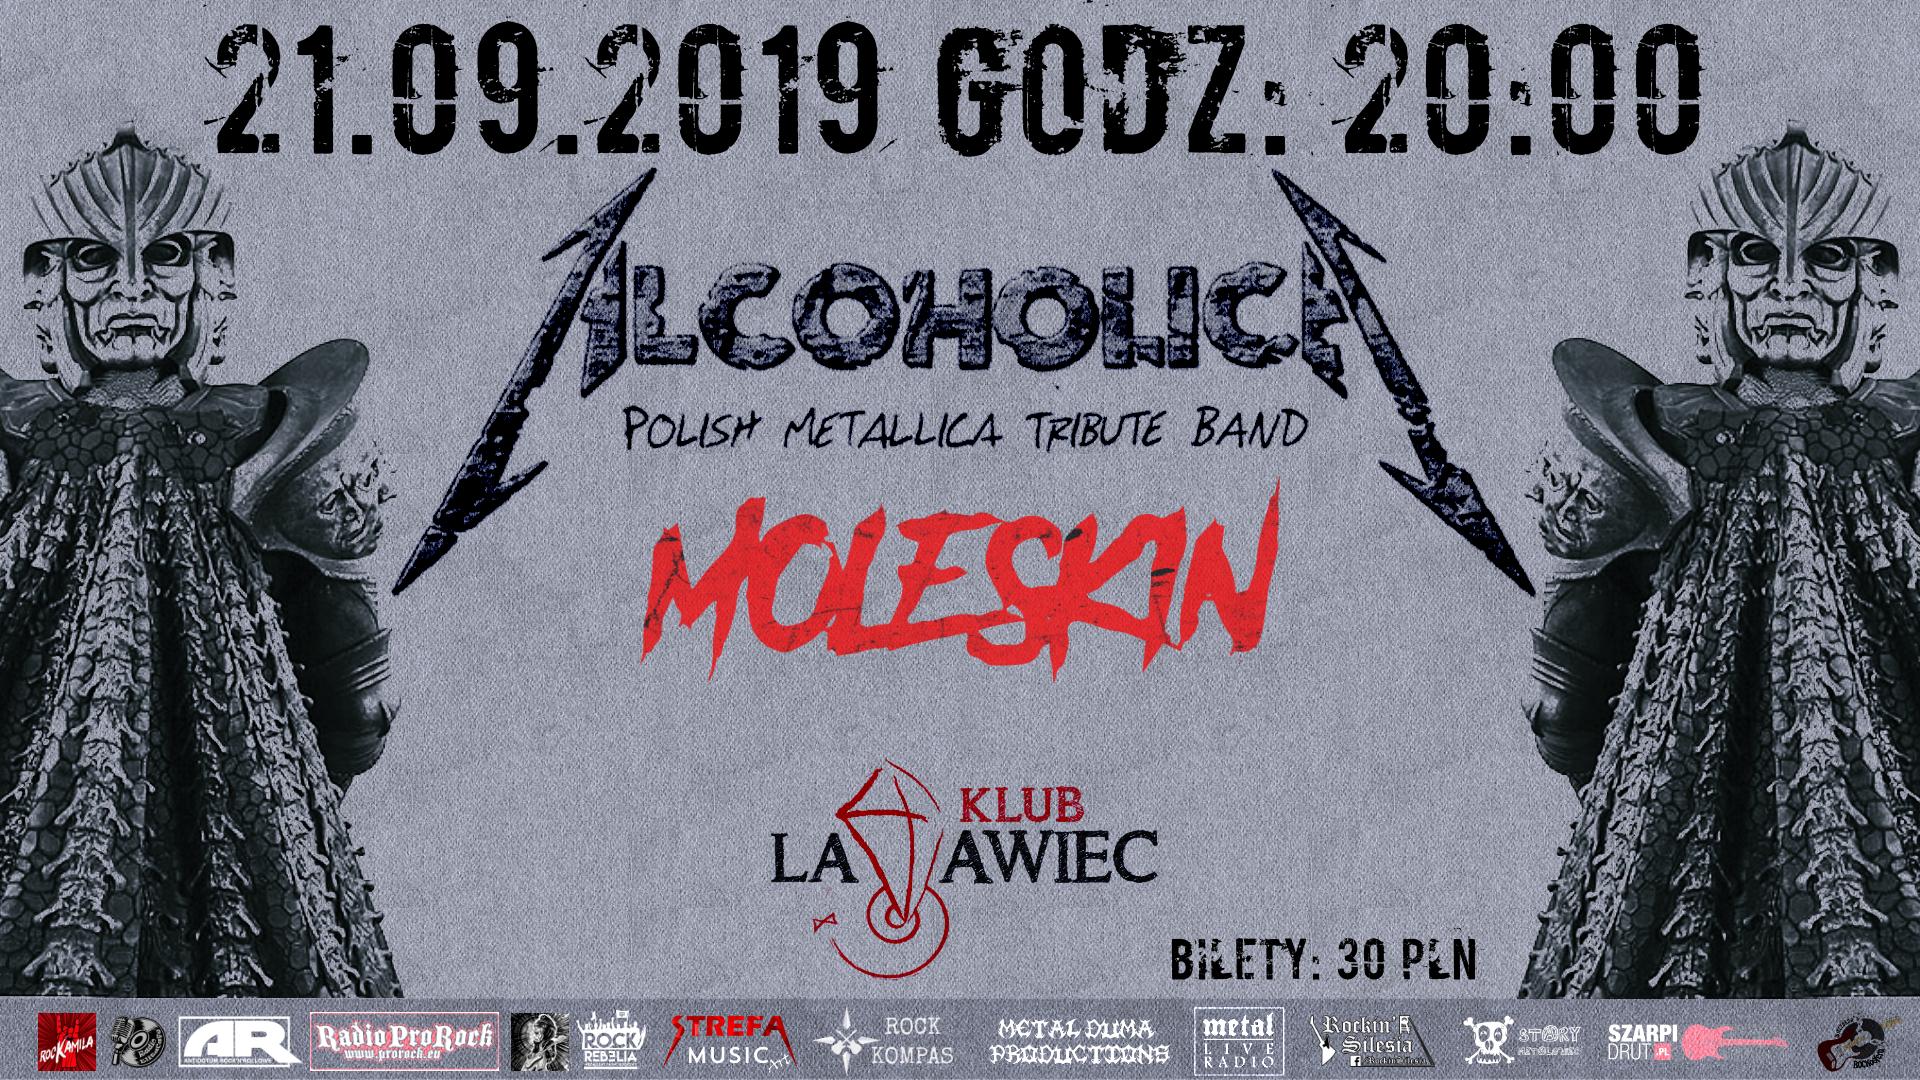 Enclose w Bdzinie - 16.11.2019 - bilety - Koncertomania